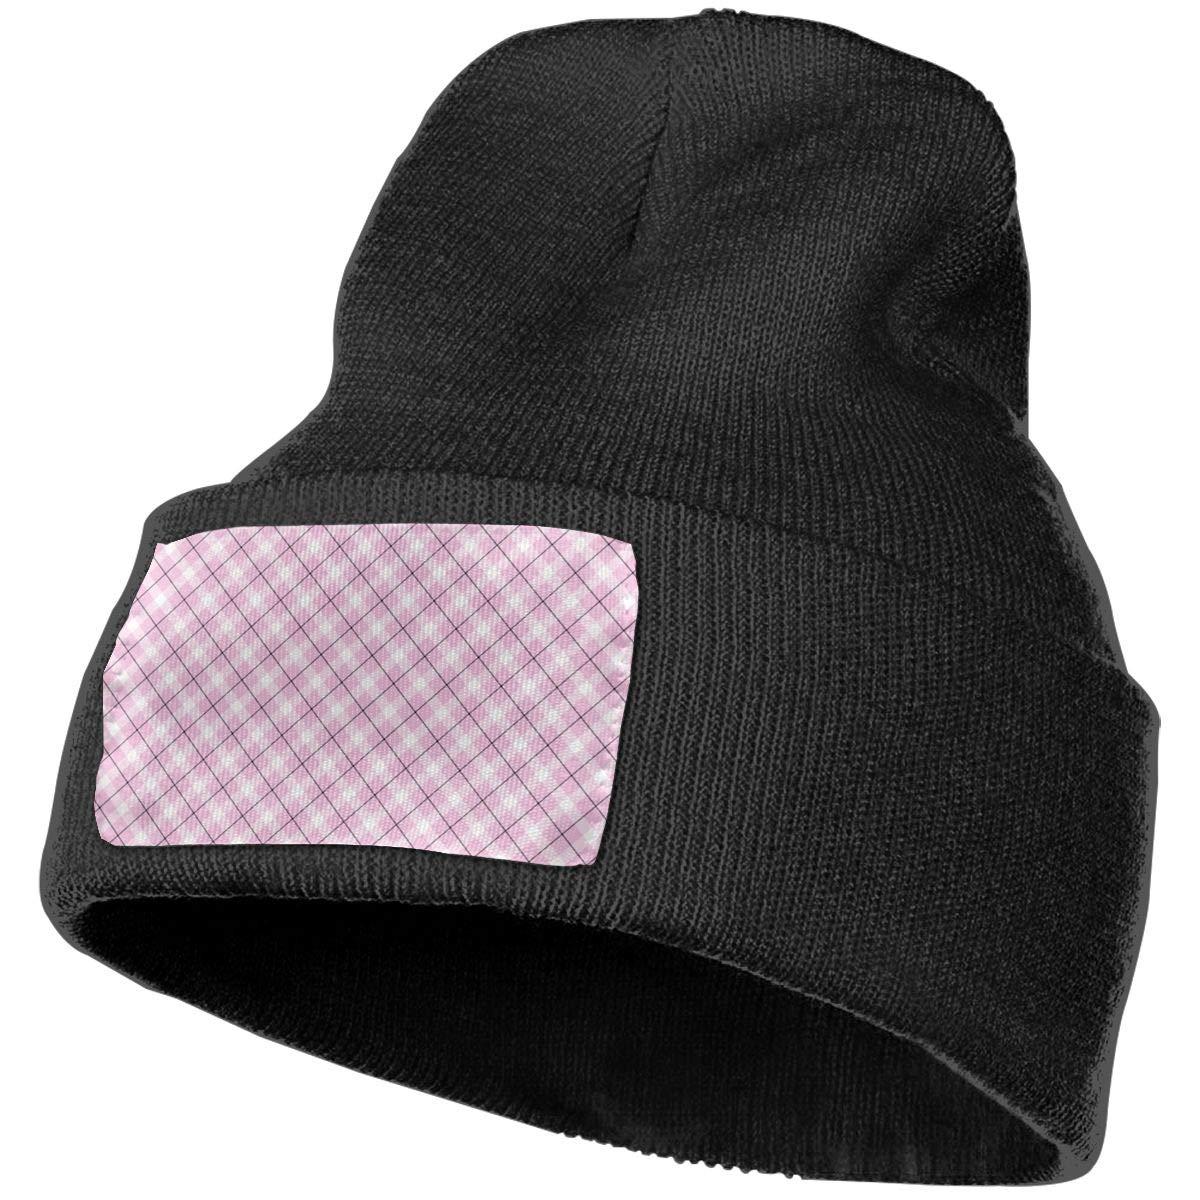 Field Rain Buffalo Stripes Unisex 100/% Acrylic Knit Hat Cap Rider Soft Beanie Hat Woolen Hat